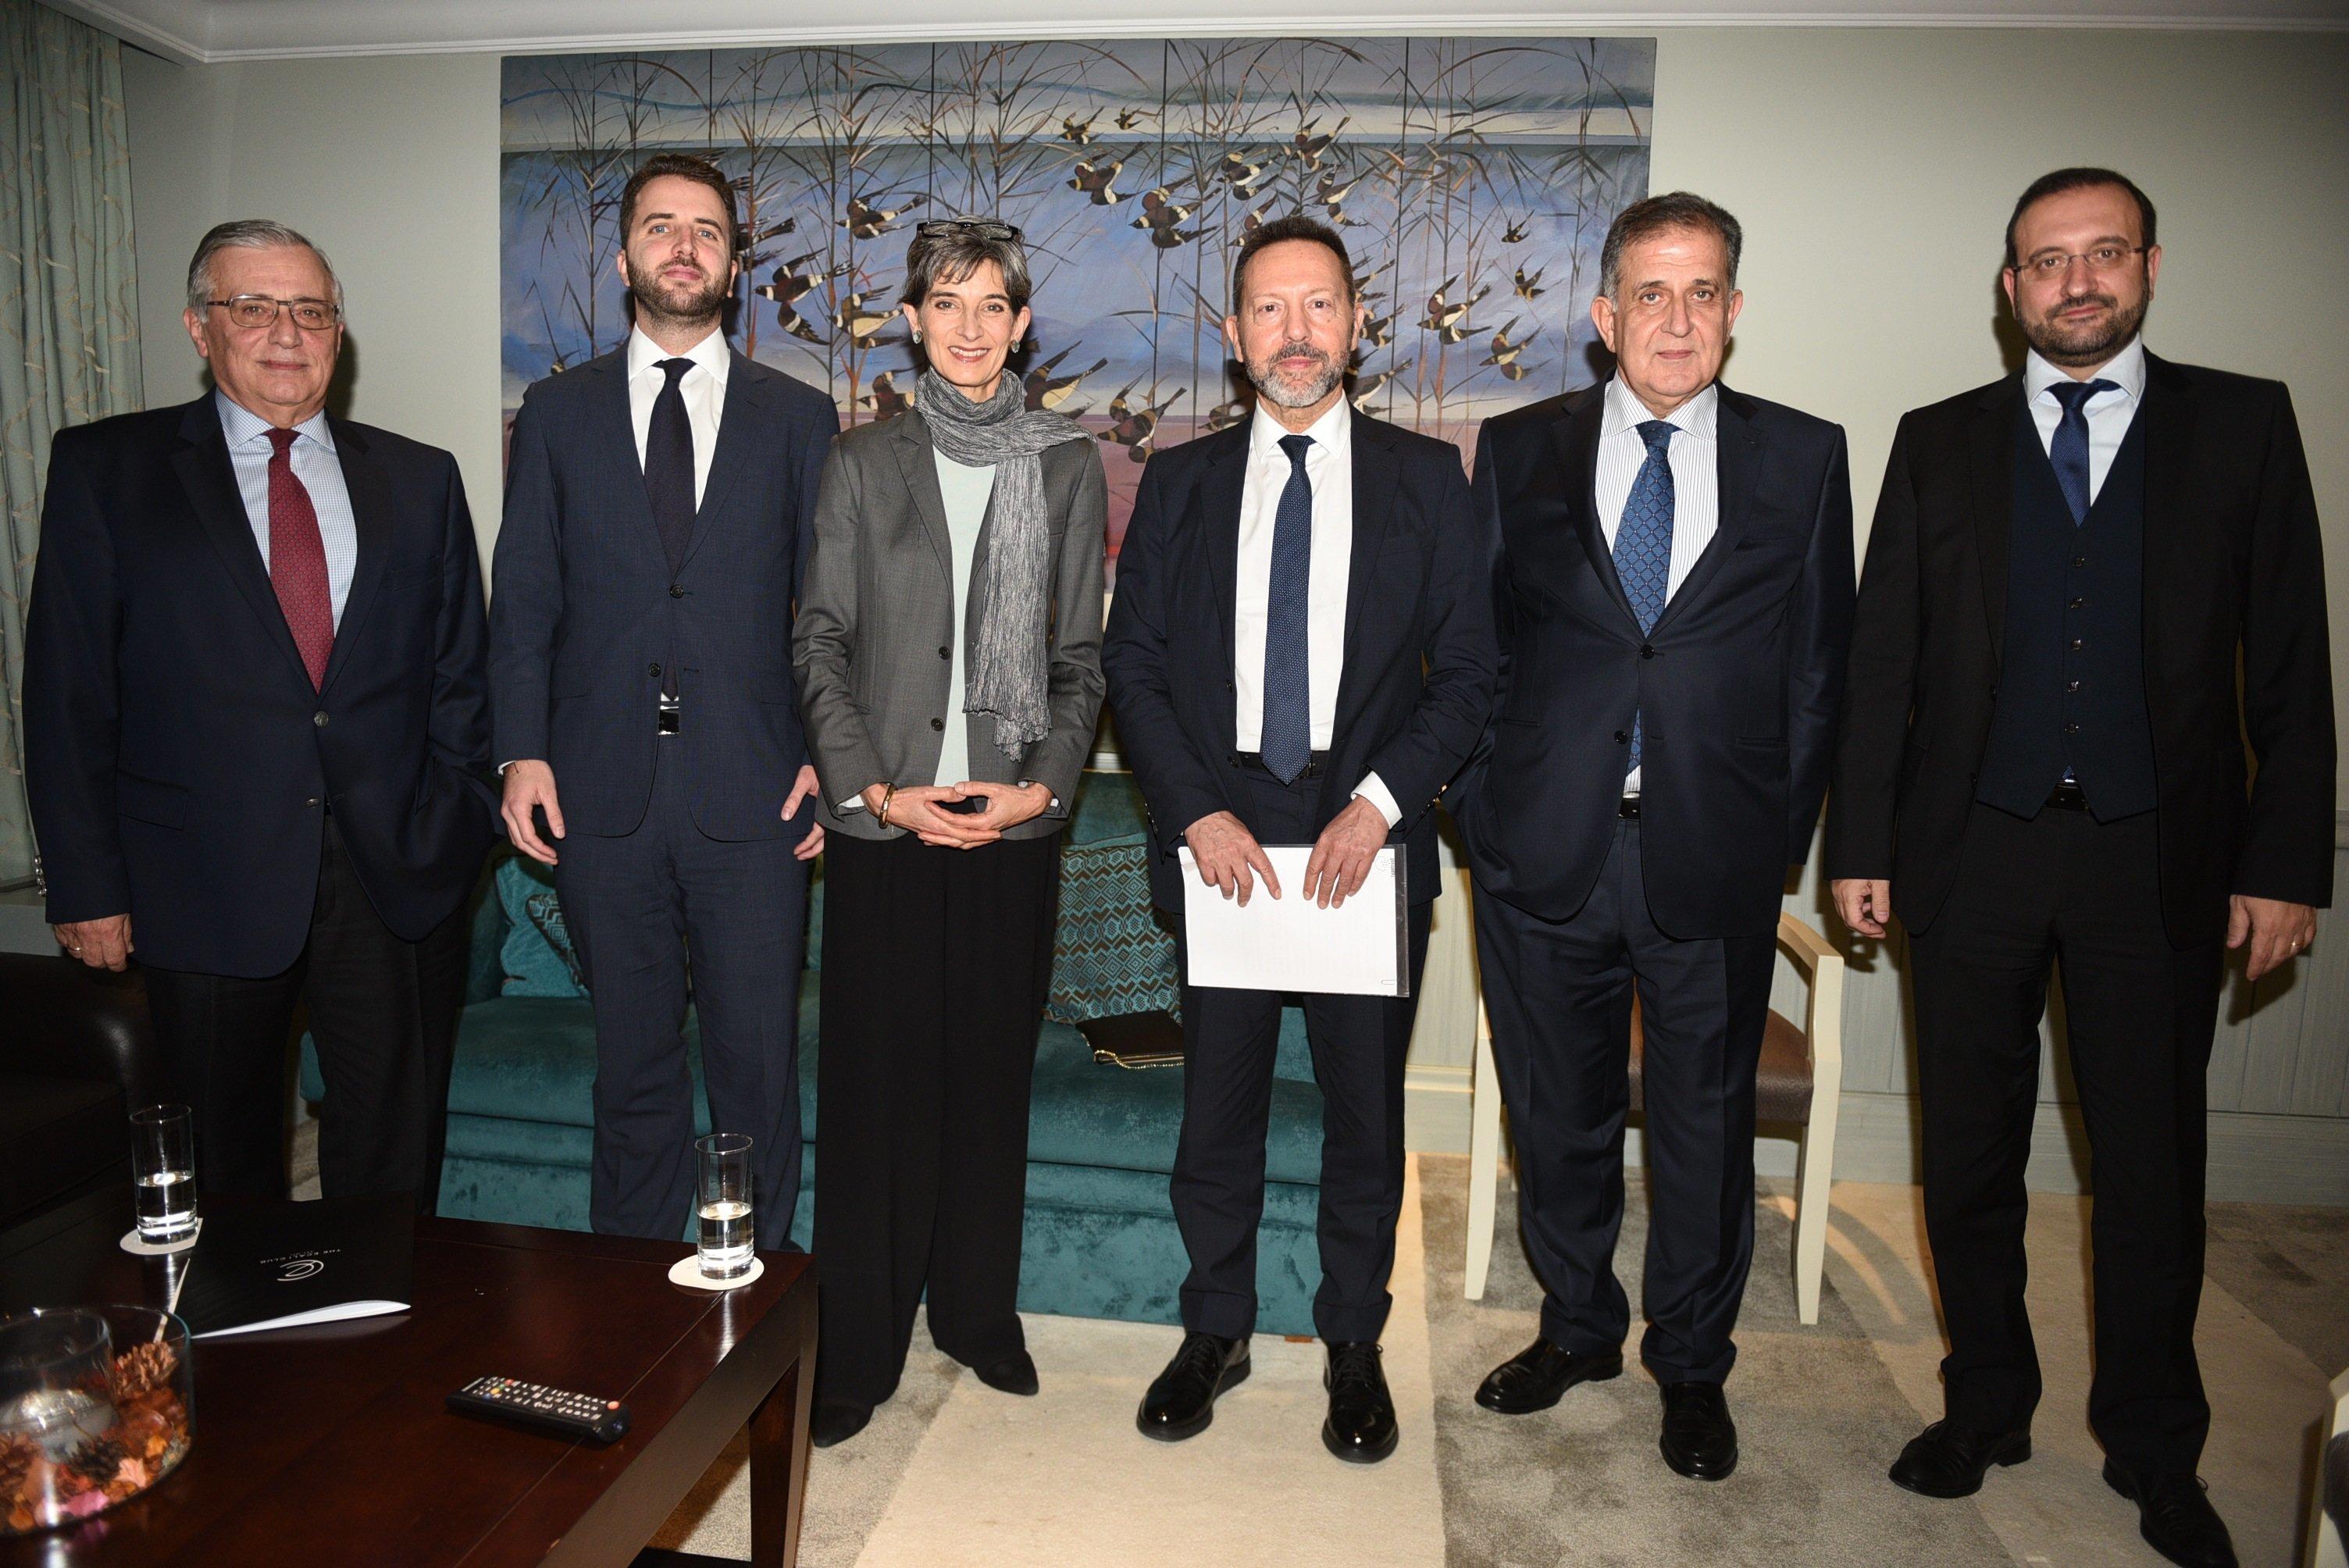 Repositioning Greece 4: Στρατηγικές ανάπτυξης και επενδυτικές ευκαιρίες για την